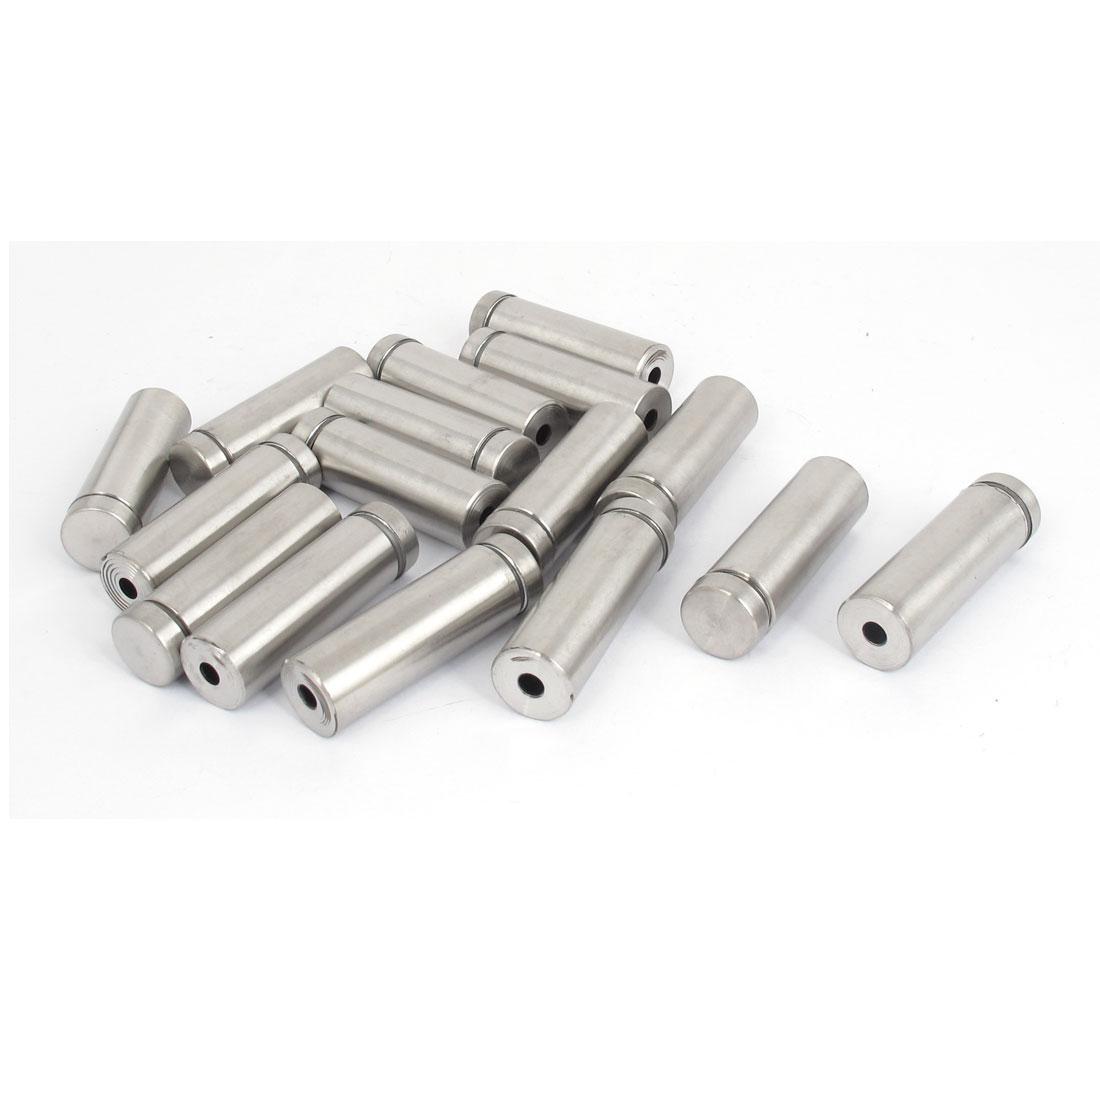 16mm x 50mm Stainless Steel Advertising Frameless Glass Standoff Pins 16pcs